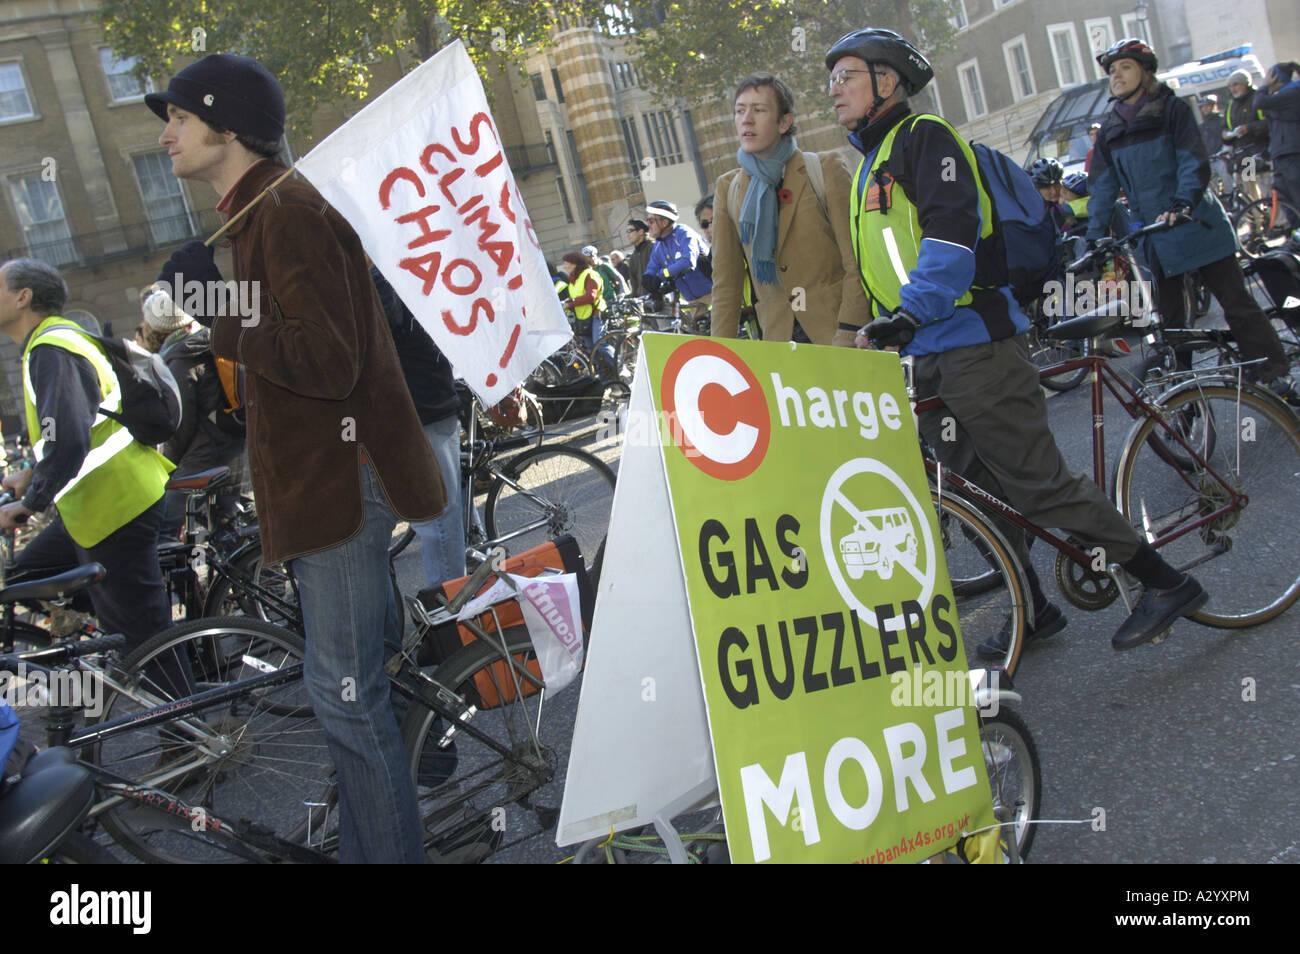 Cyclists demo outside downing St on their way to Trafalgar Sq Cliimate Change demo London Nov 4th 2006 - Stock Image